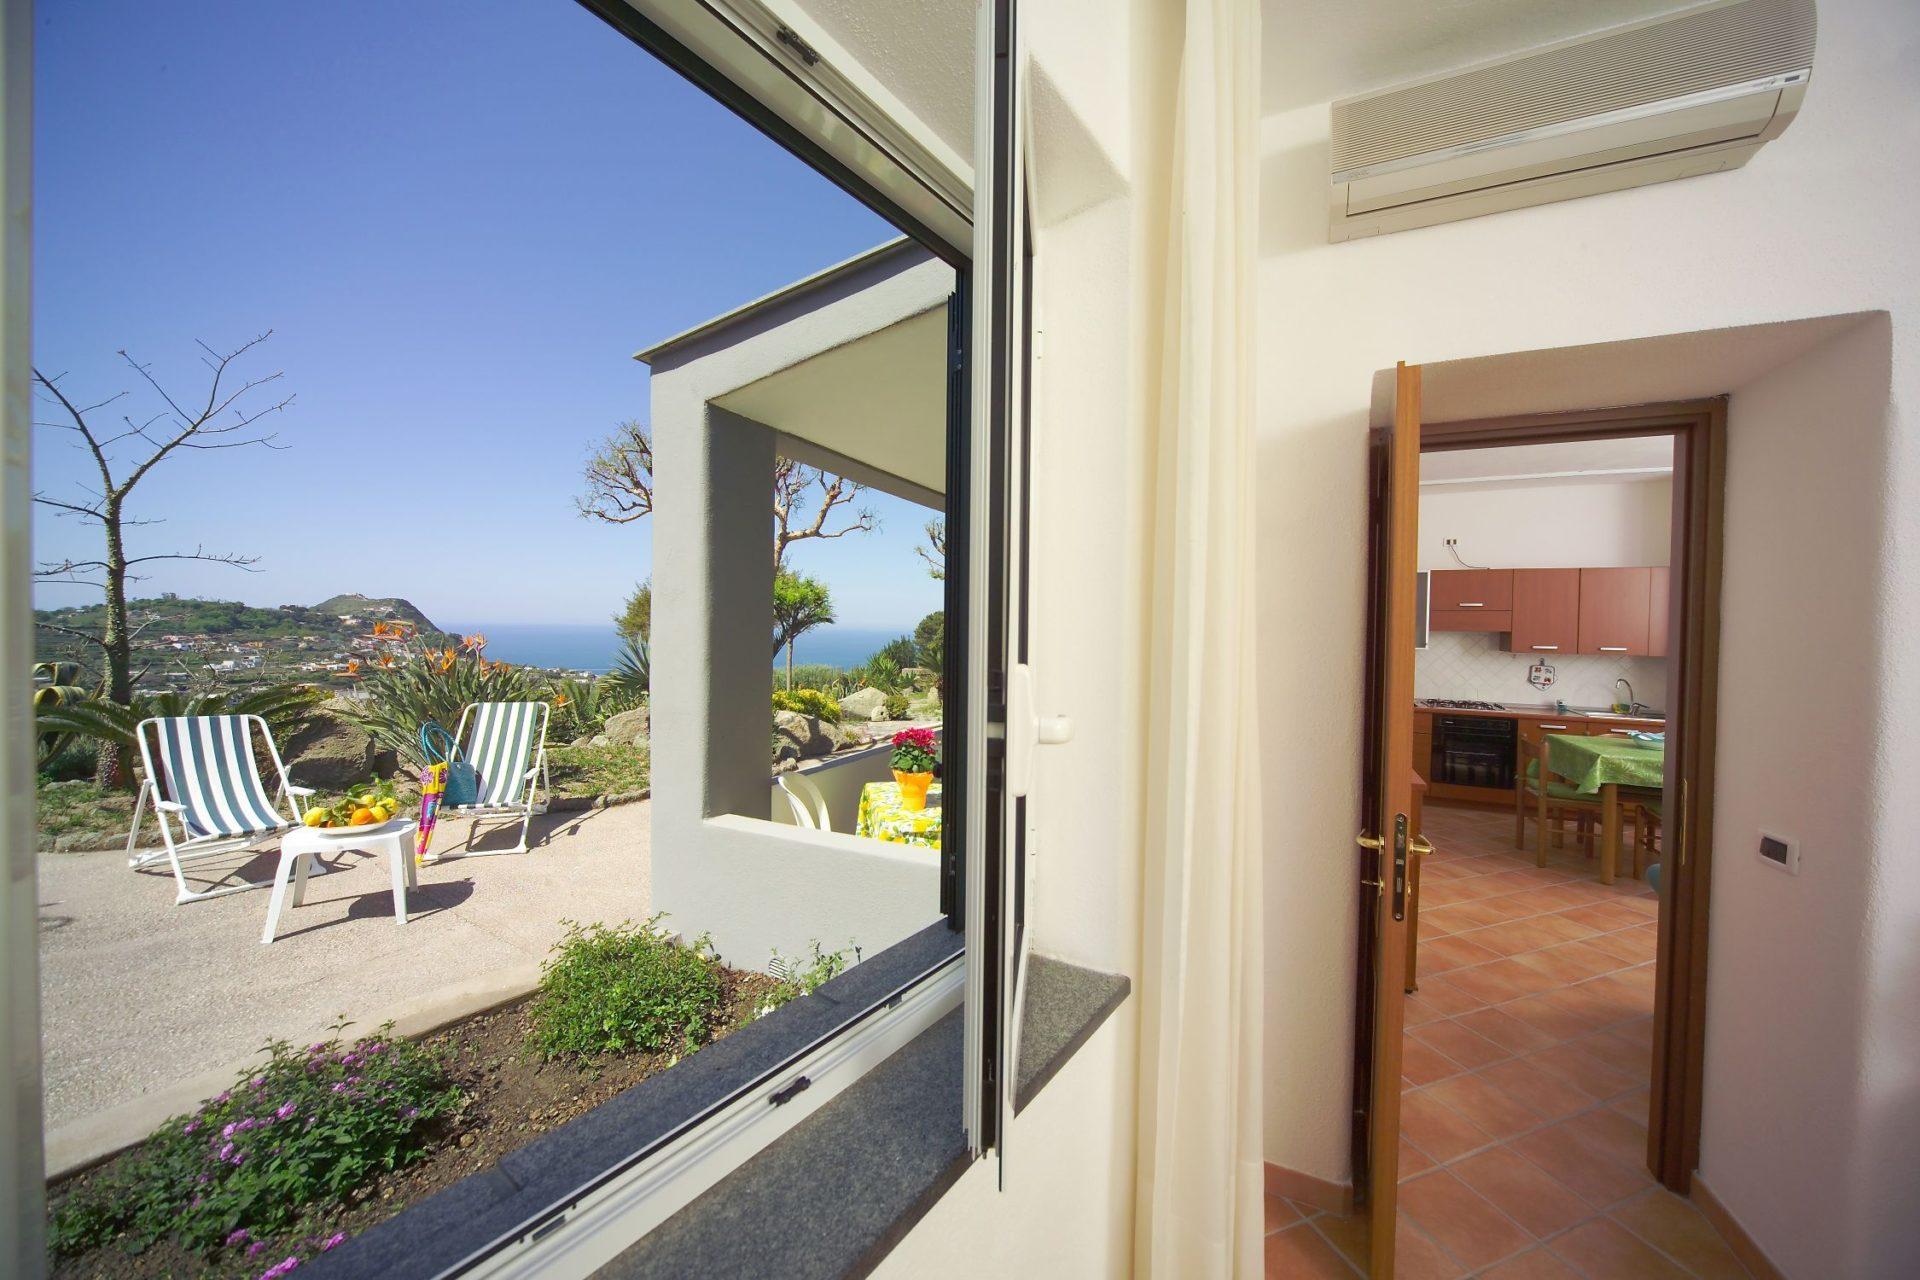 Appartamenti Vacanza Famiglie | Appartamenti Casa Ischitana